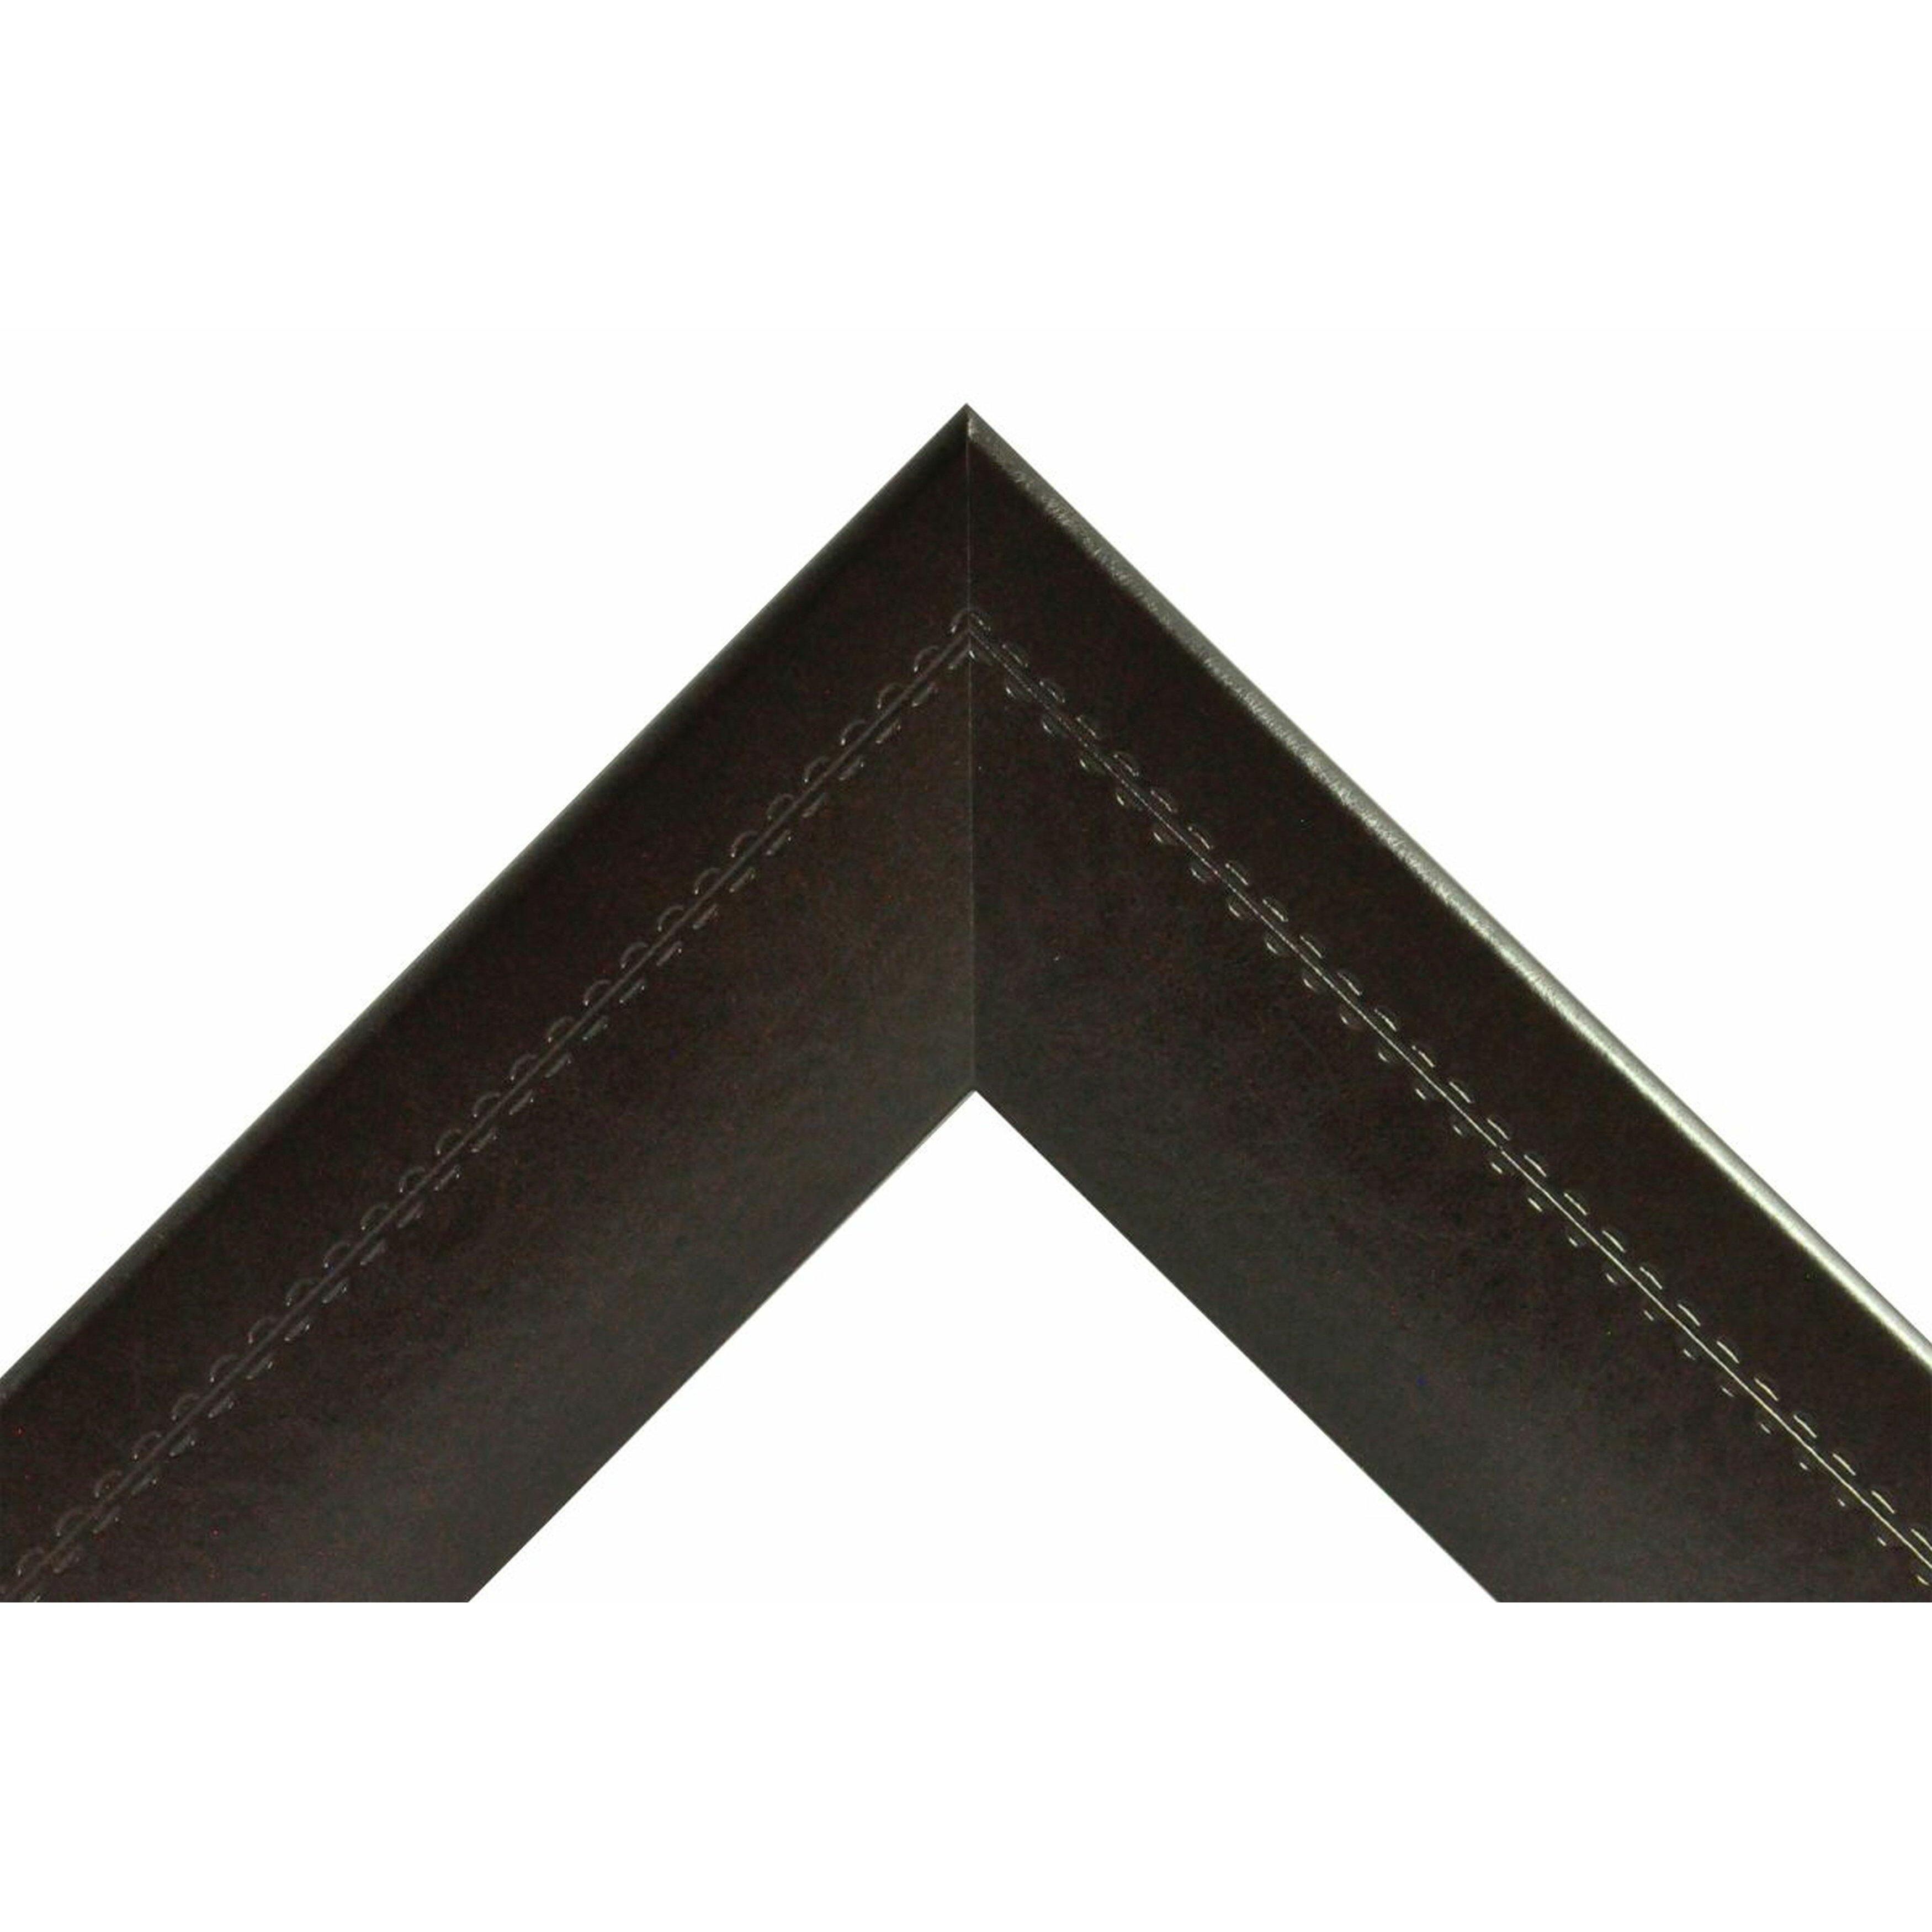 Rayne Mirrors Jovie Jane Espresso Stitched Leather Full